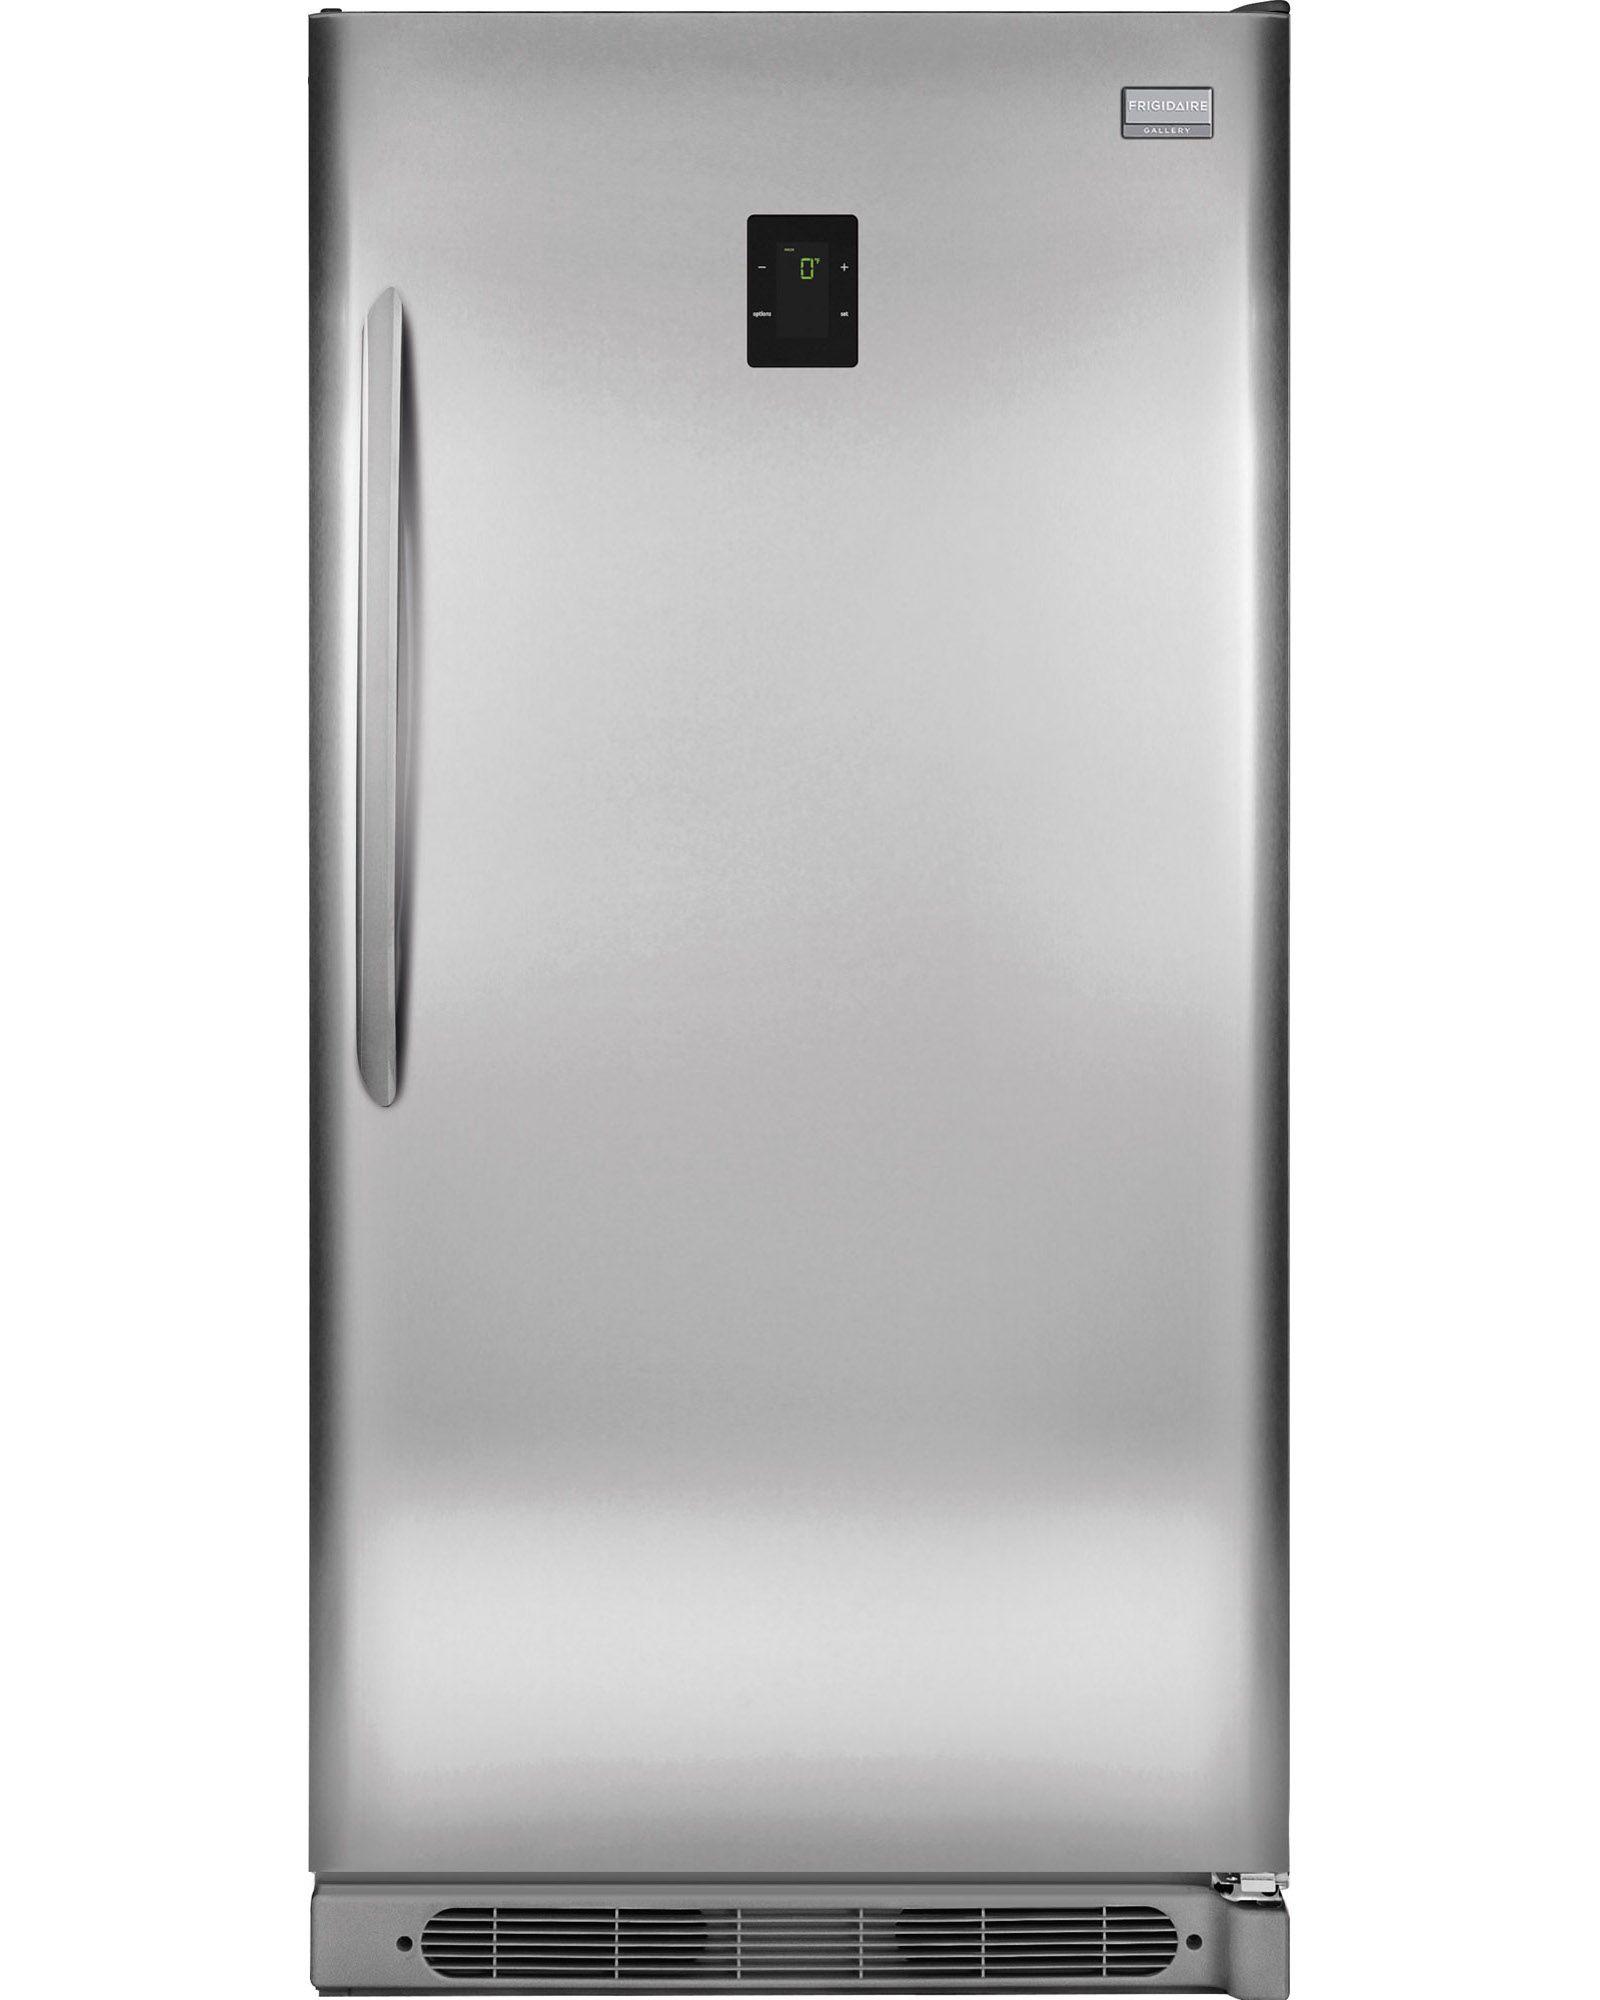 Frigidaire 16.9 Cu. Ft. Convertible Refrigerator/Freezer